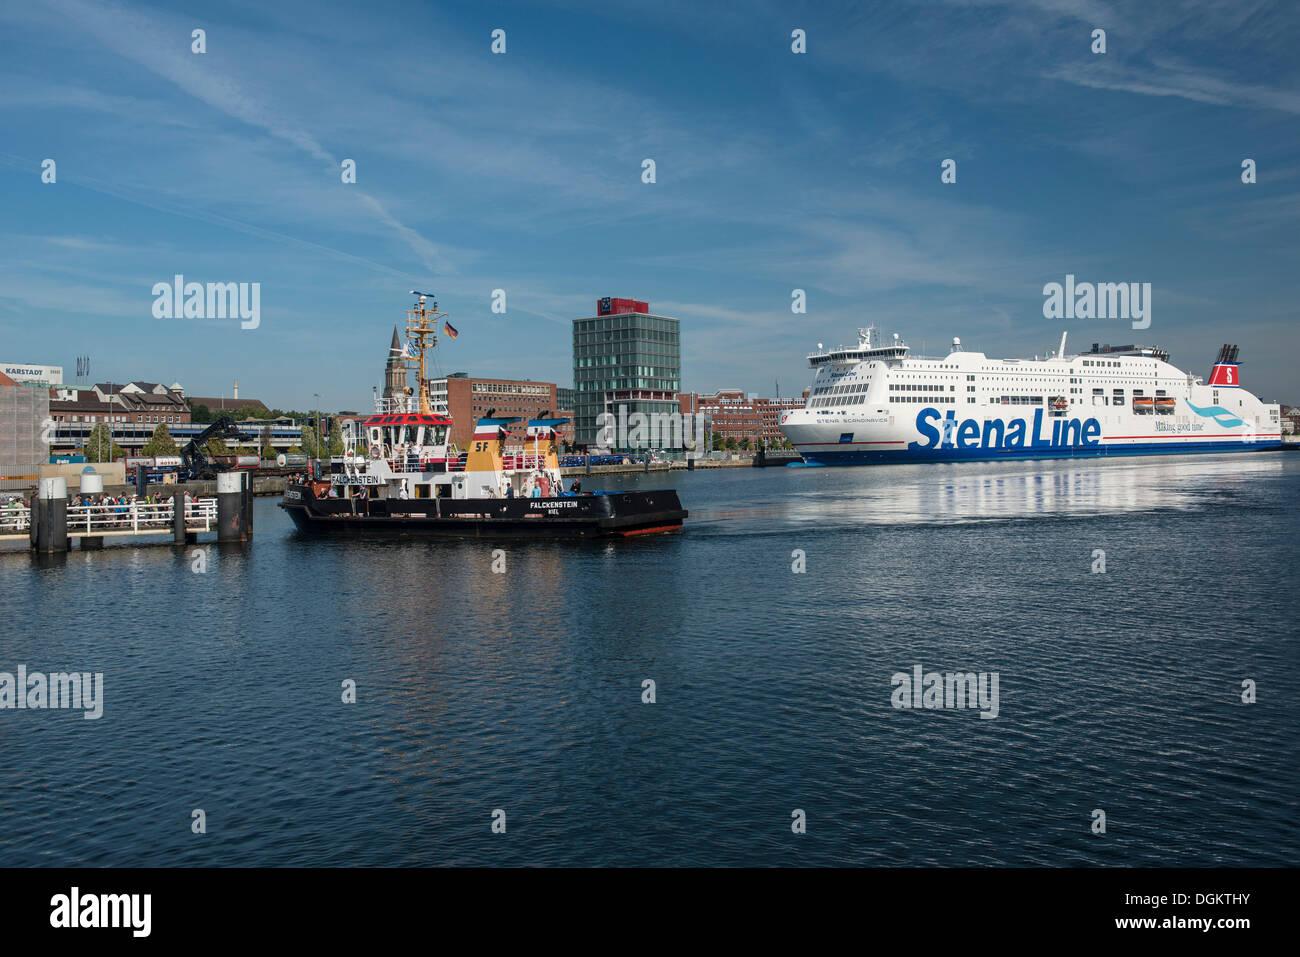 Kiel Fjord on the harbour, ferry dock, Hafenhaus Kiel building and the Stena Line dock, international ferries, Kiel - Stock Image